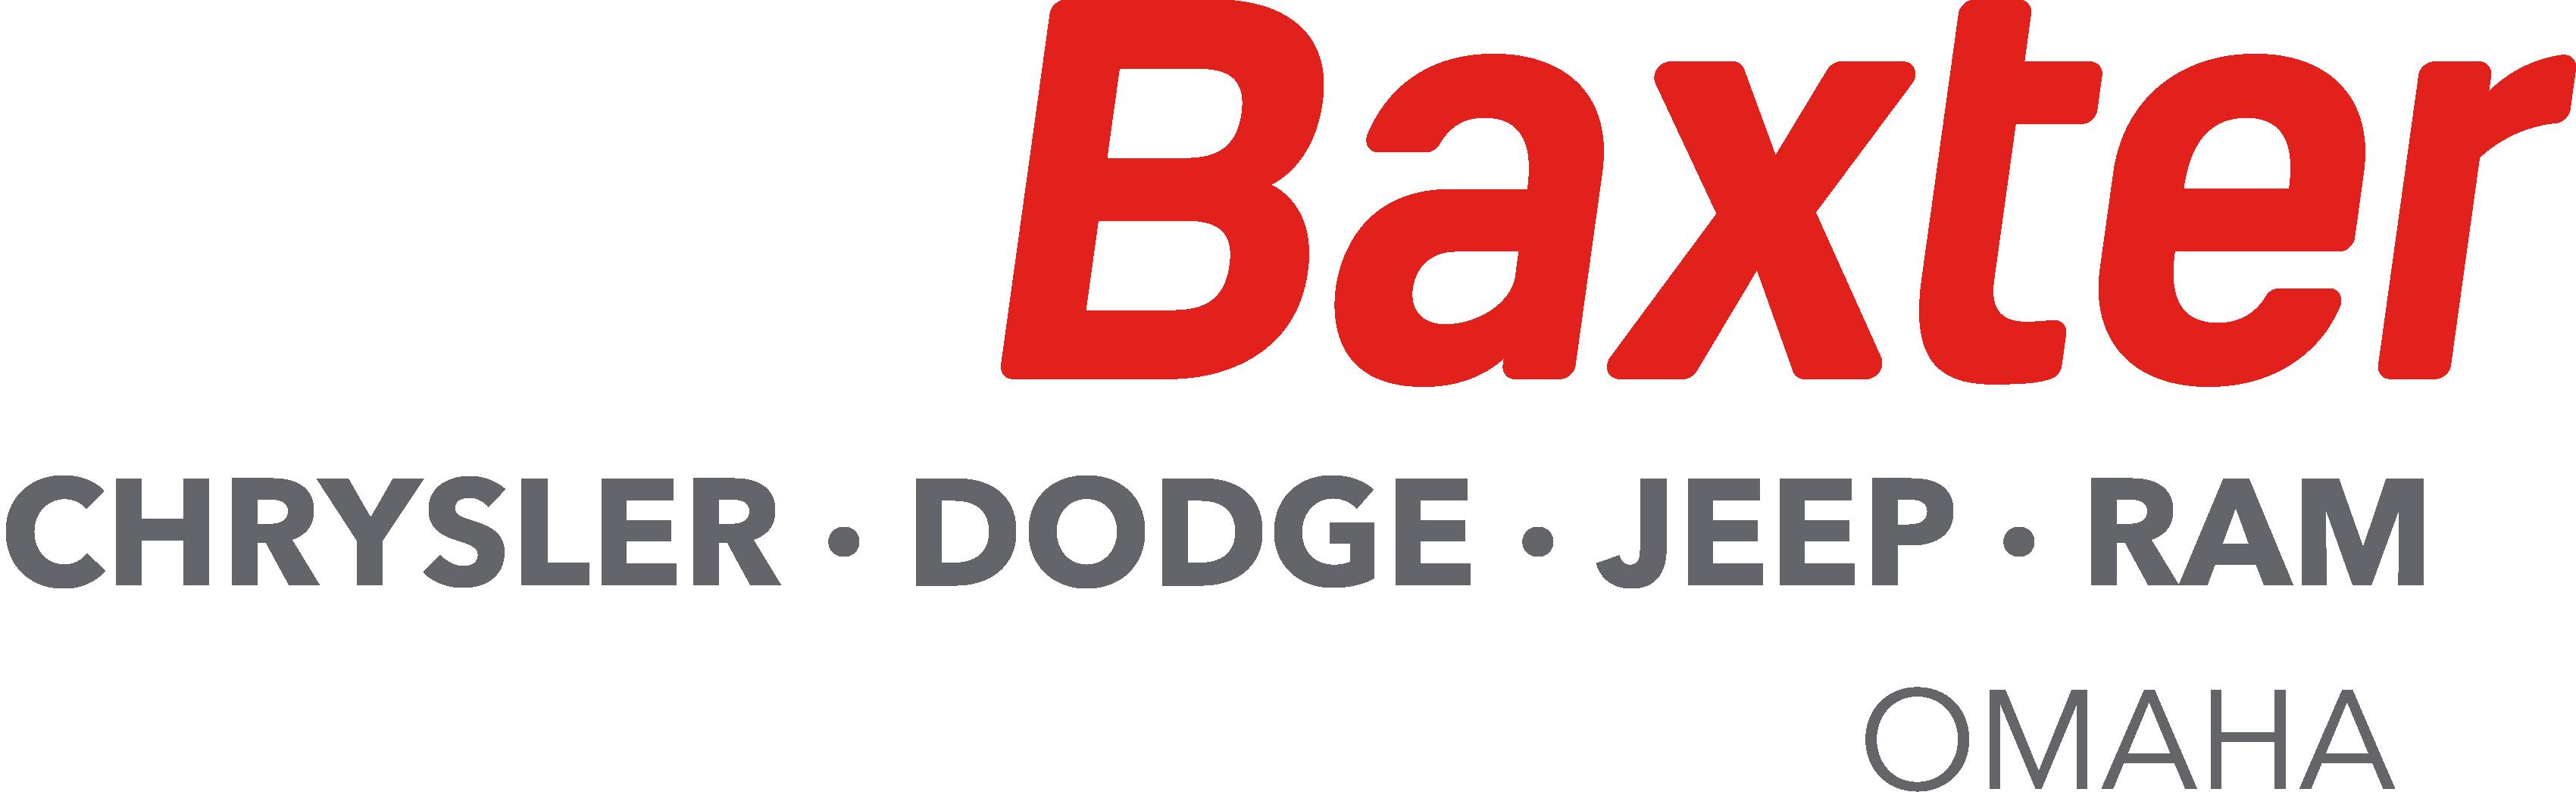 Service Department Baxter Chrysler Dodge Jeep Ram Fiat Of Omaha